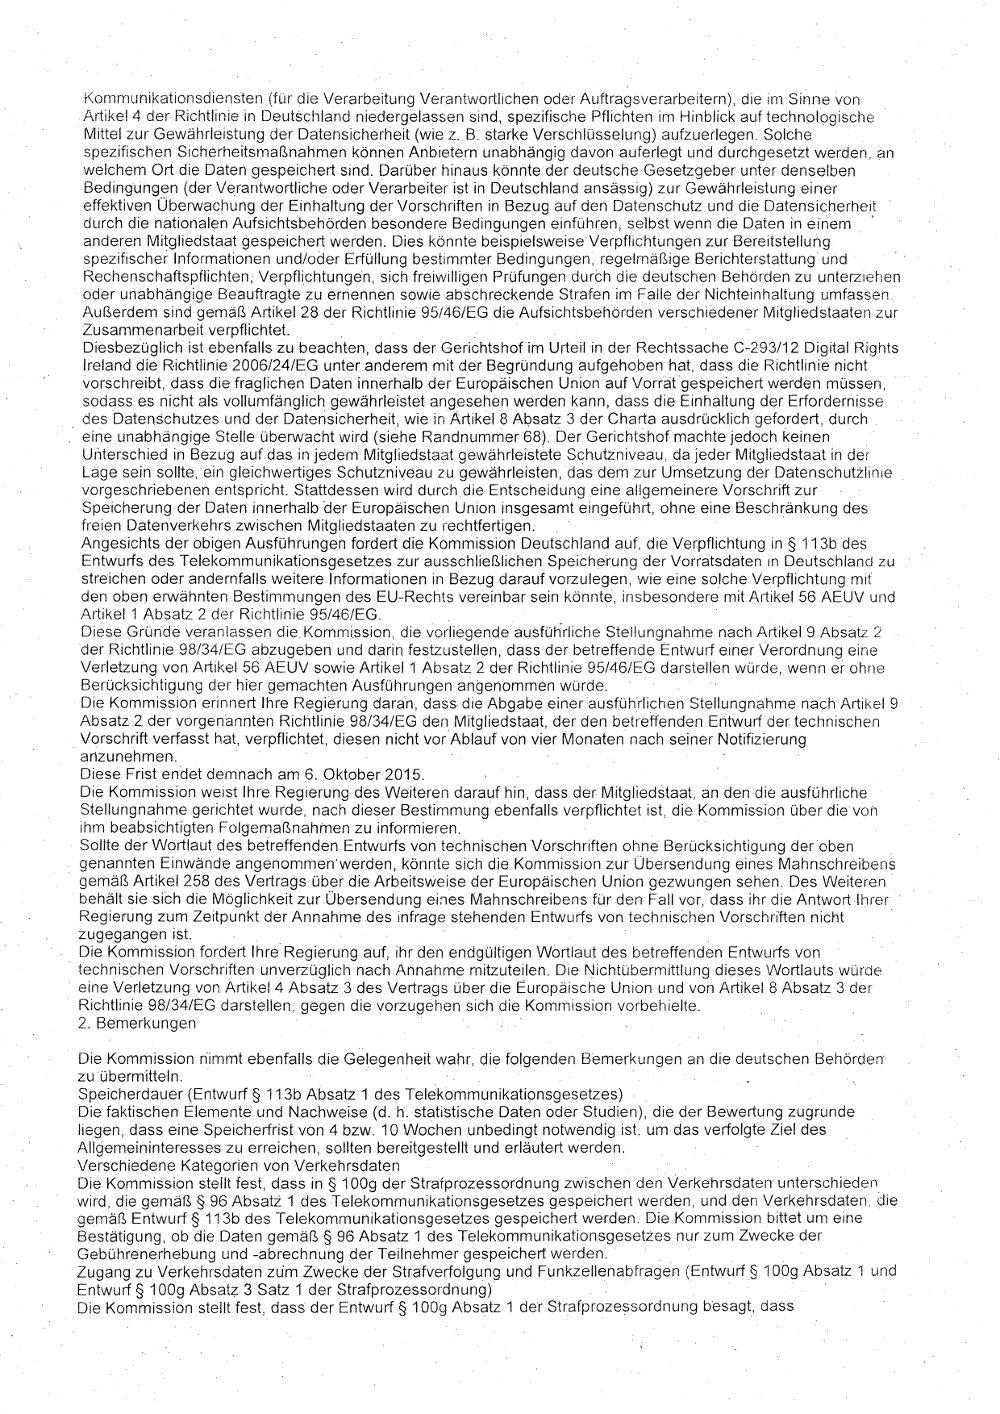 freiheitsfoo Wiki | Main / 20141103Brief-an-Avramopoulos